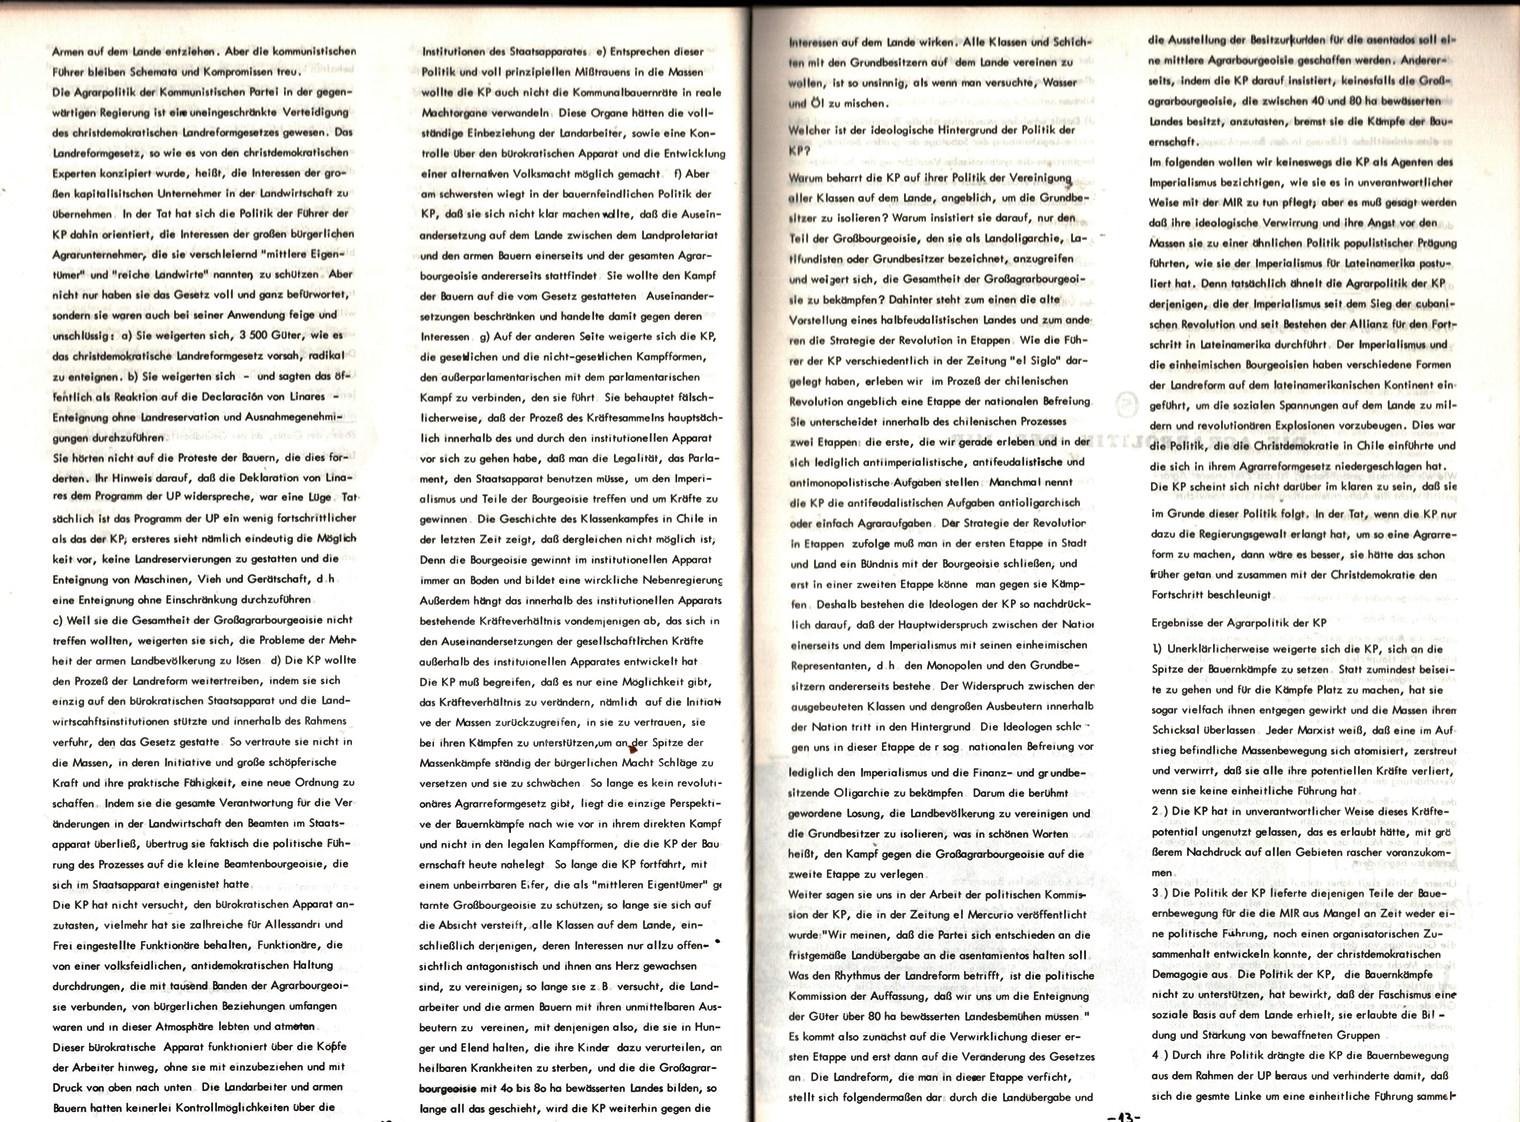 Lateinamerika_heute_Sonderbericht_Chile_Nr_04_010